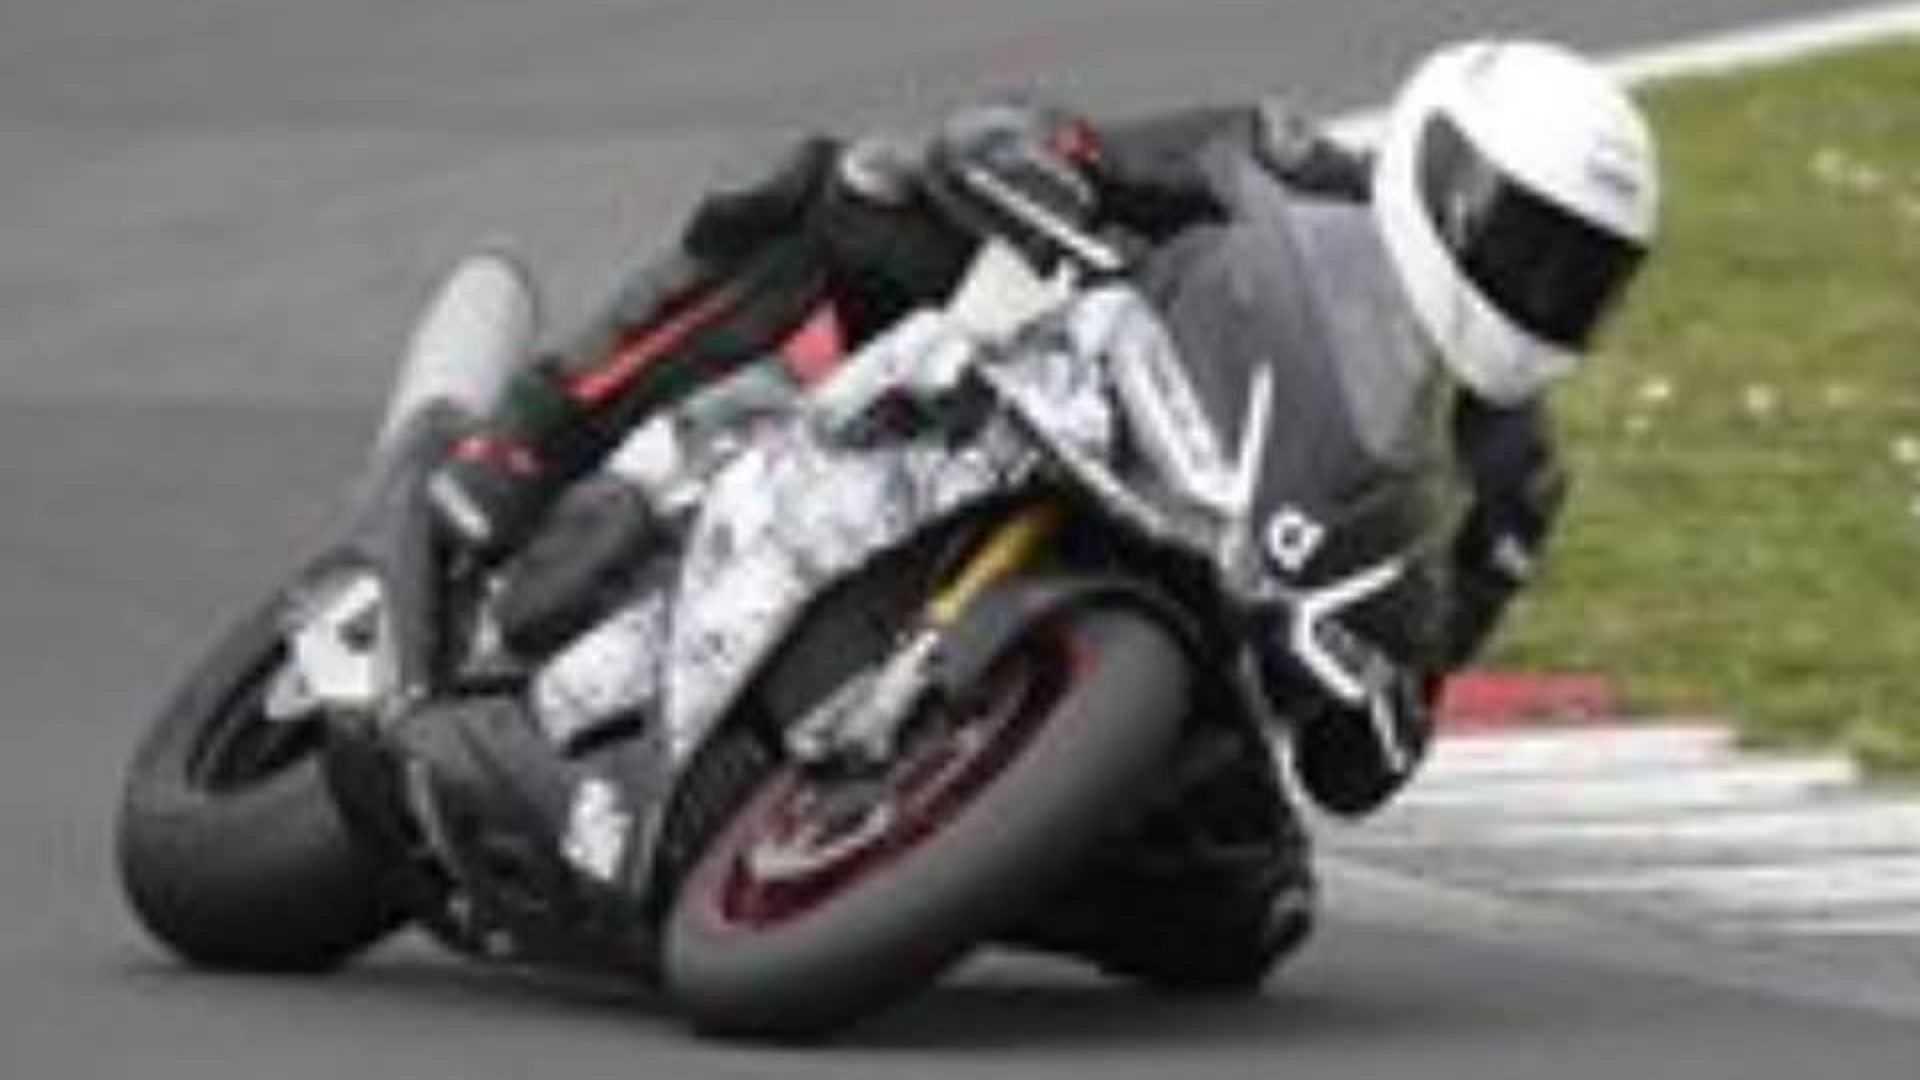 2021 Aprilia Rsv4 Spotted At Vallelunga Track Test Visordown